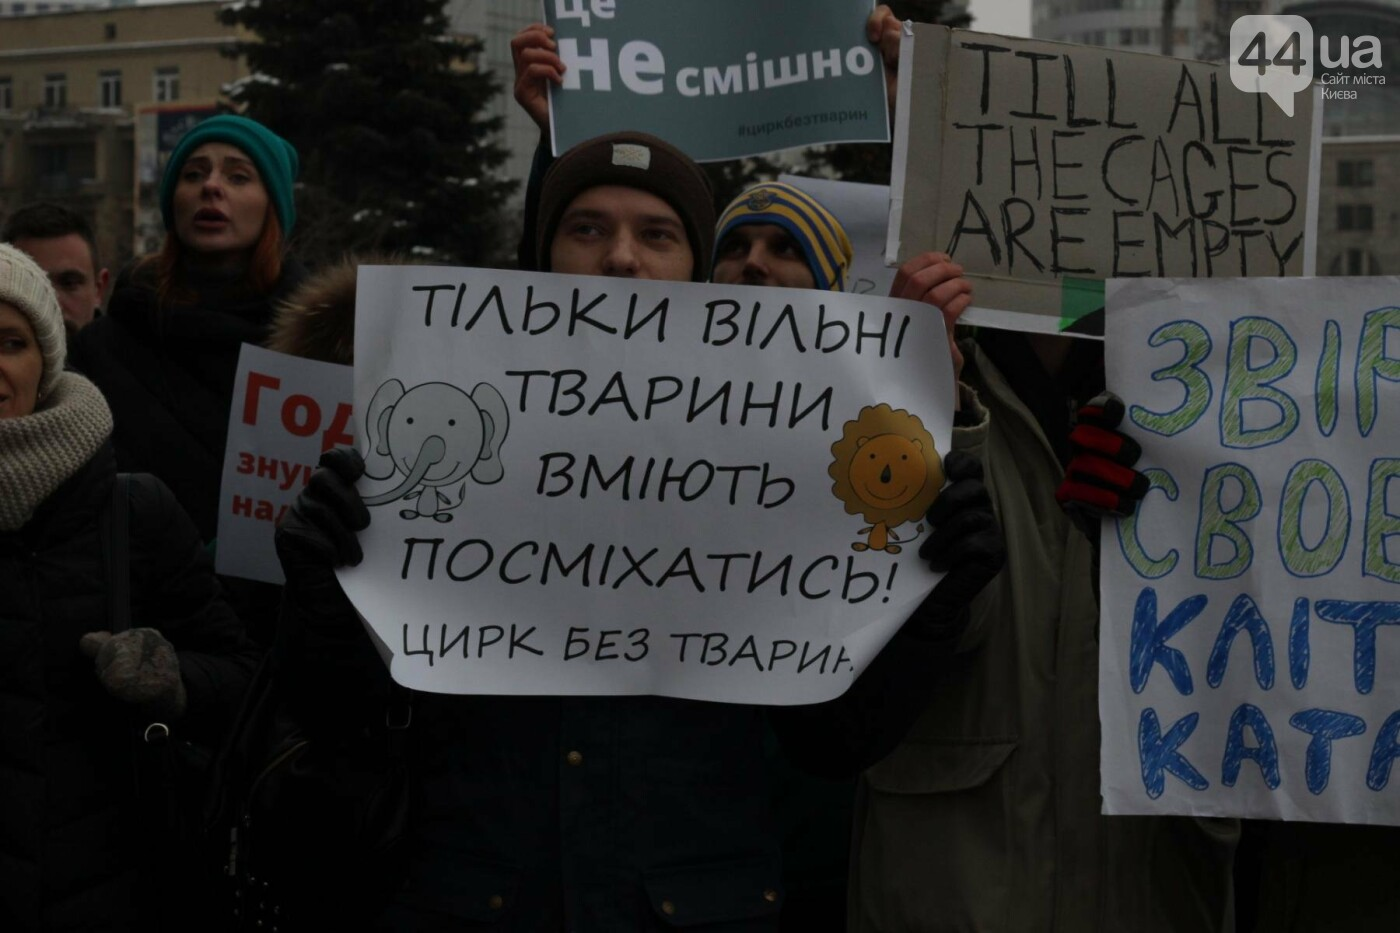 Цирк без животных: как в Киеве прошла акция протеста, фото-21